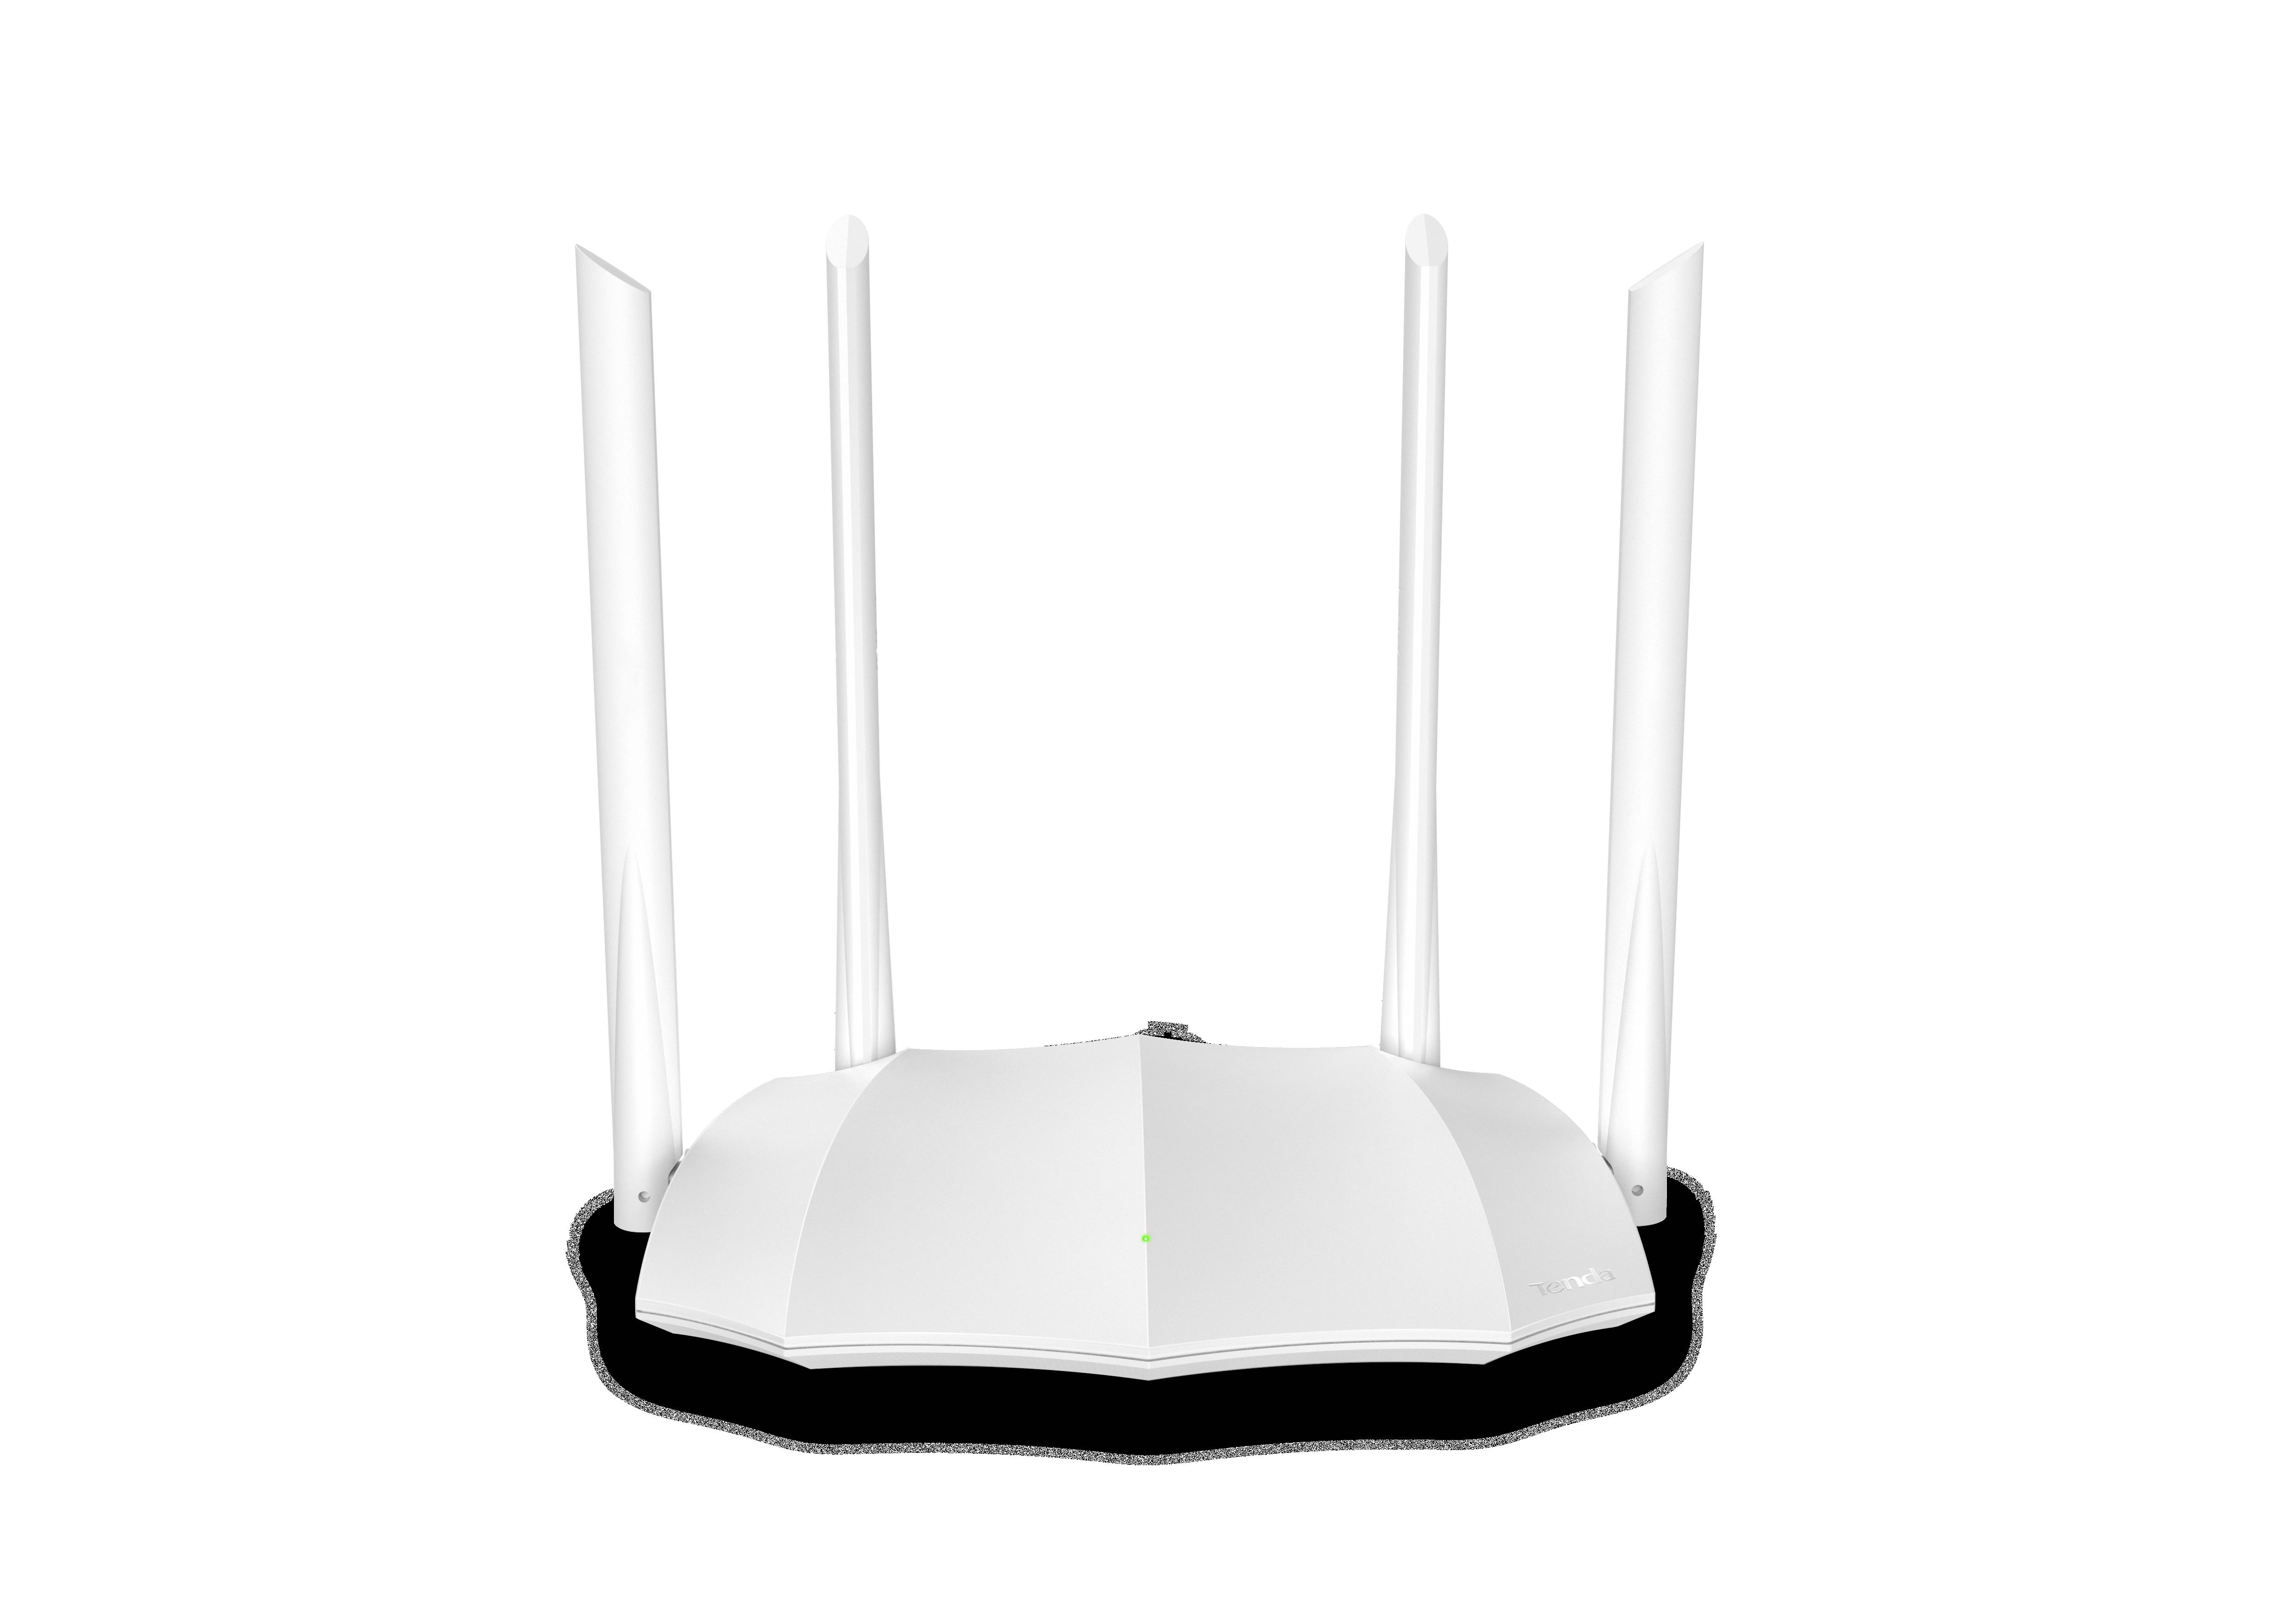 Tenda AC5 802.11ac Dual Band WiFi Router | AC5